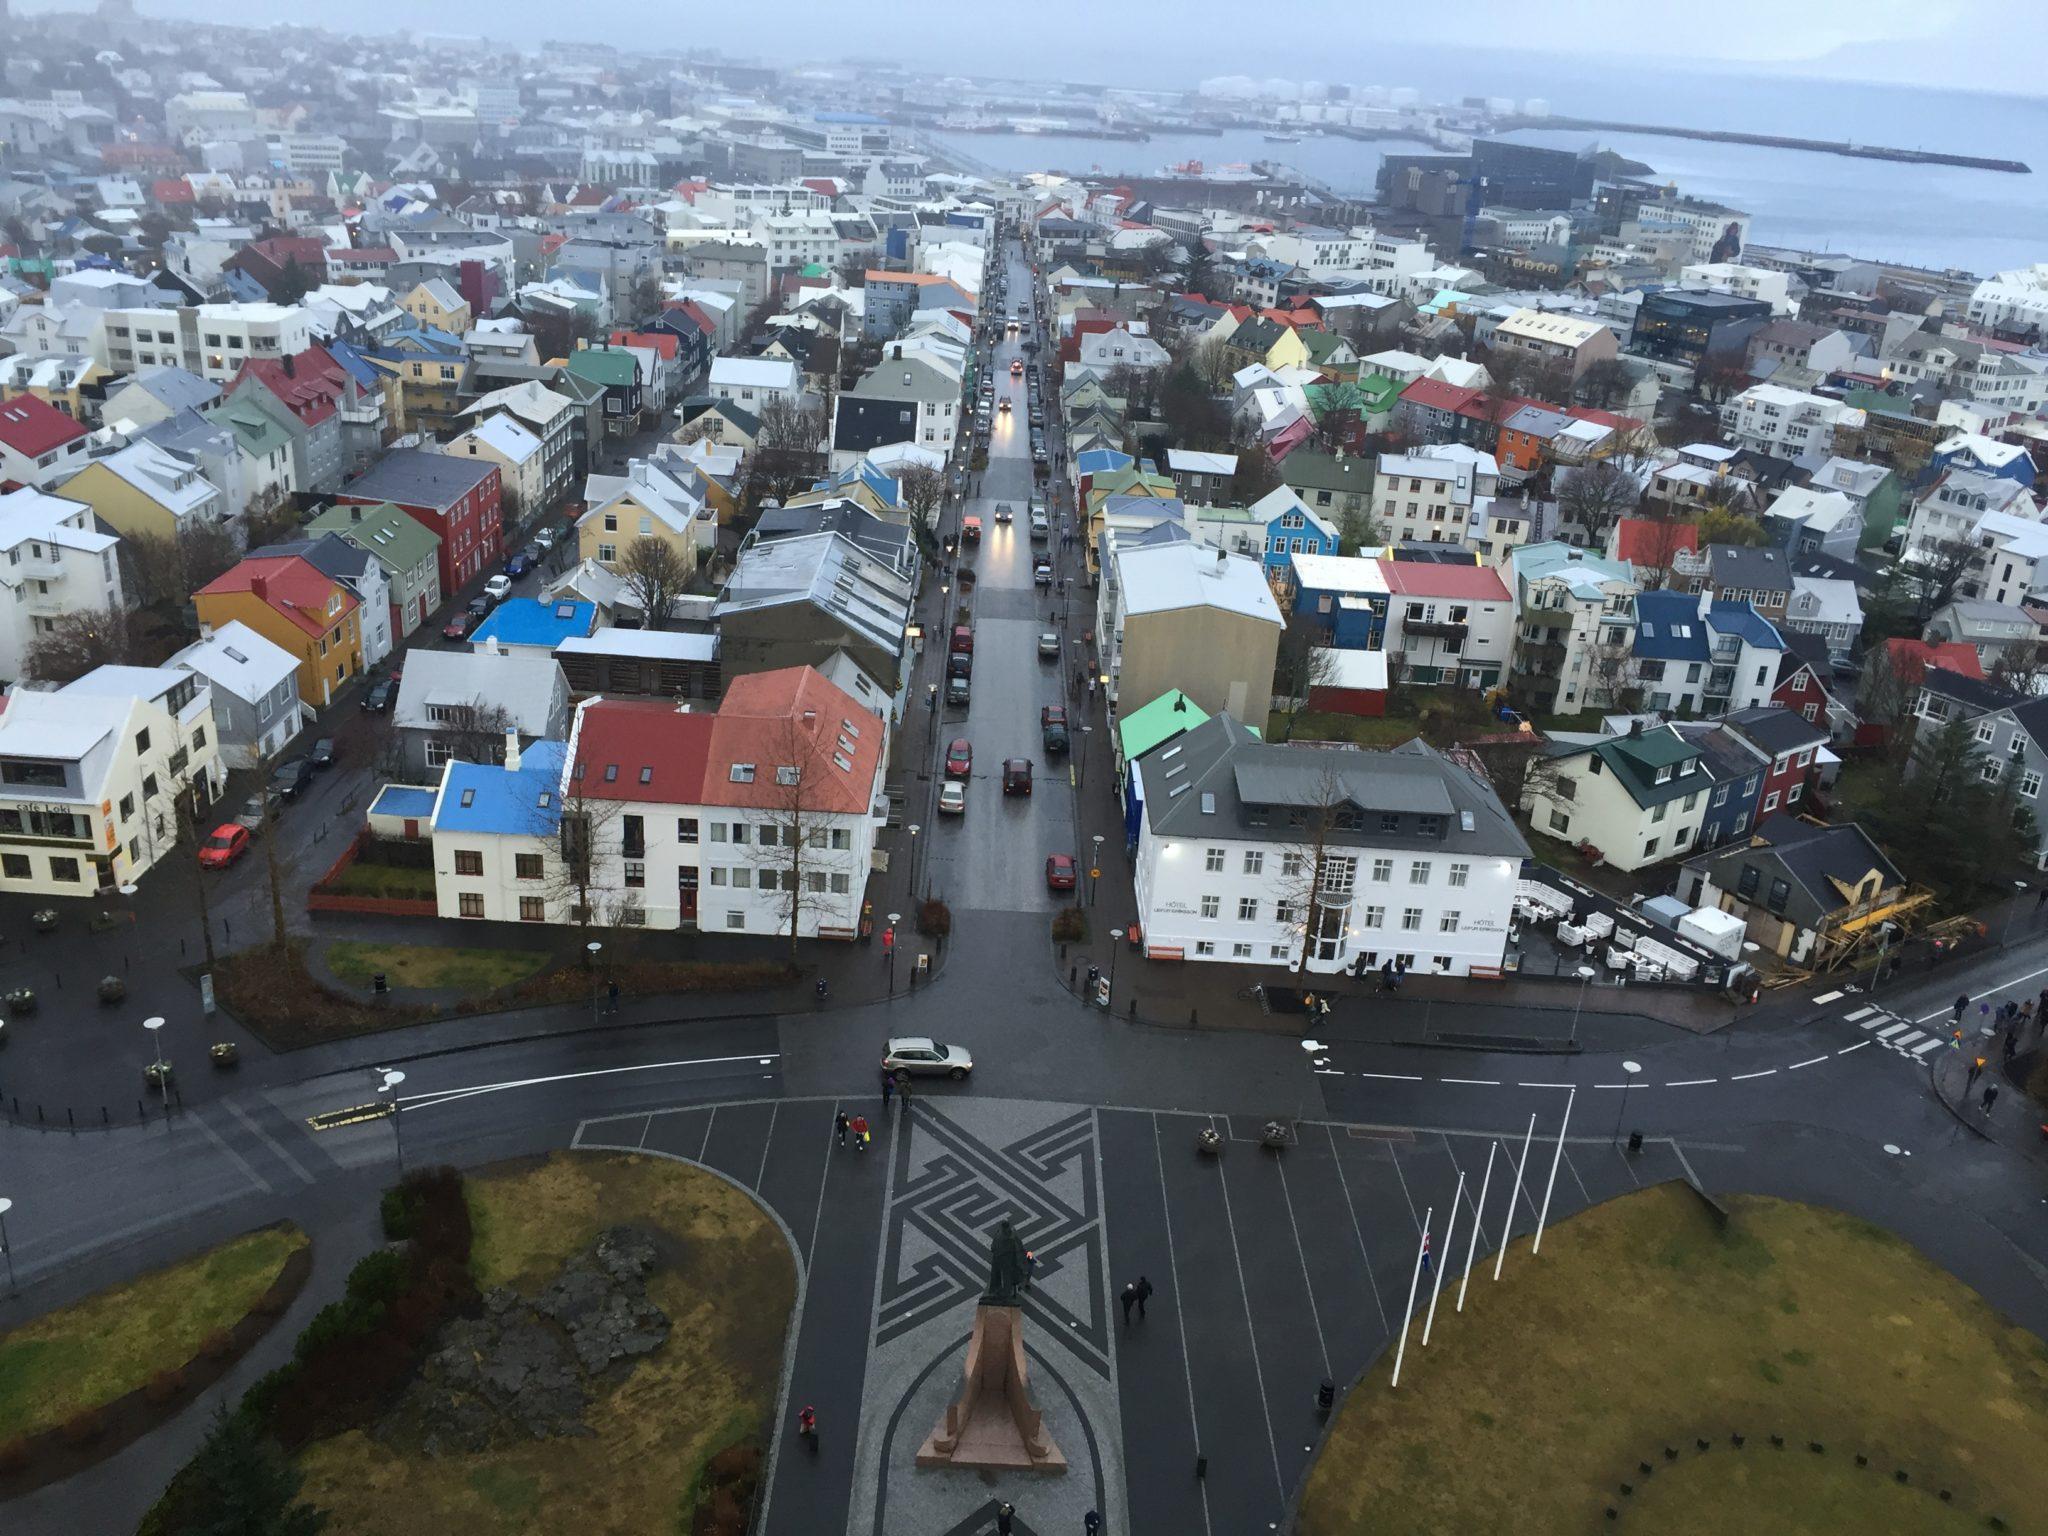 Reykjavik Iceland from sky